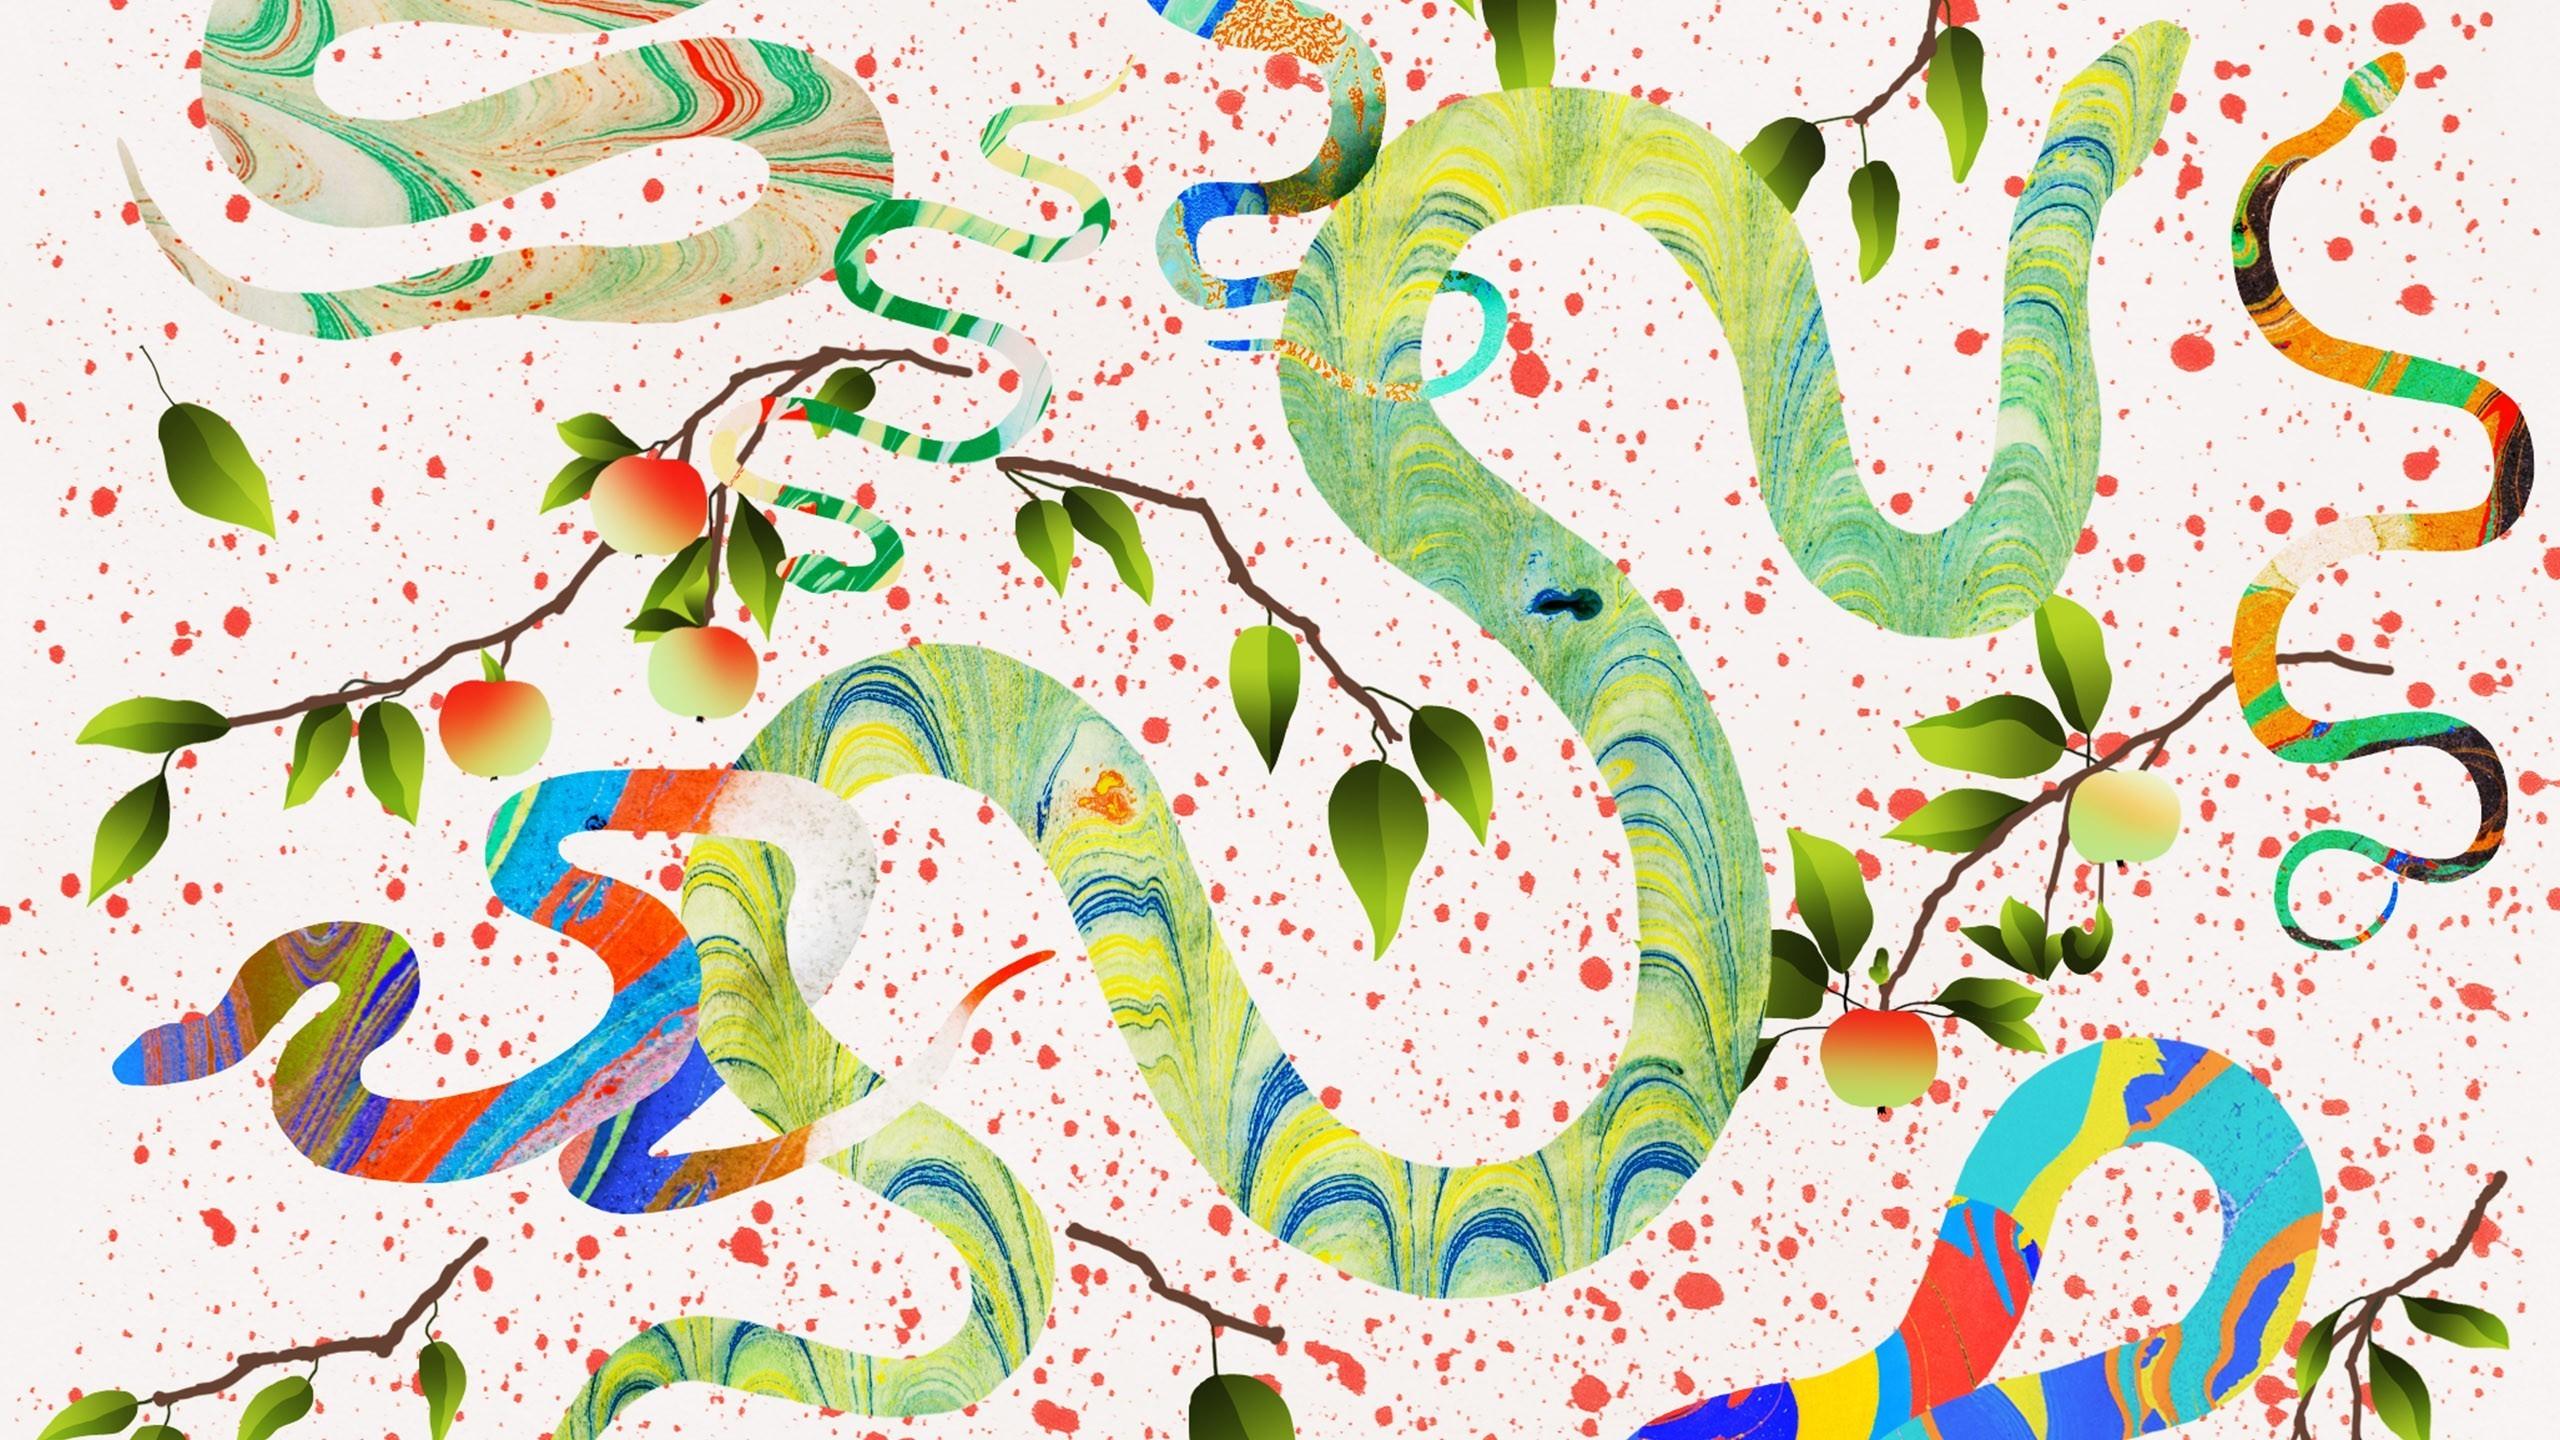 Hd 3d Wallpaper Mobile9 Splatter Backgrounds 183 ①